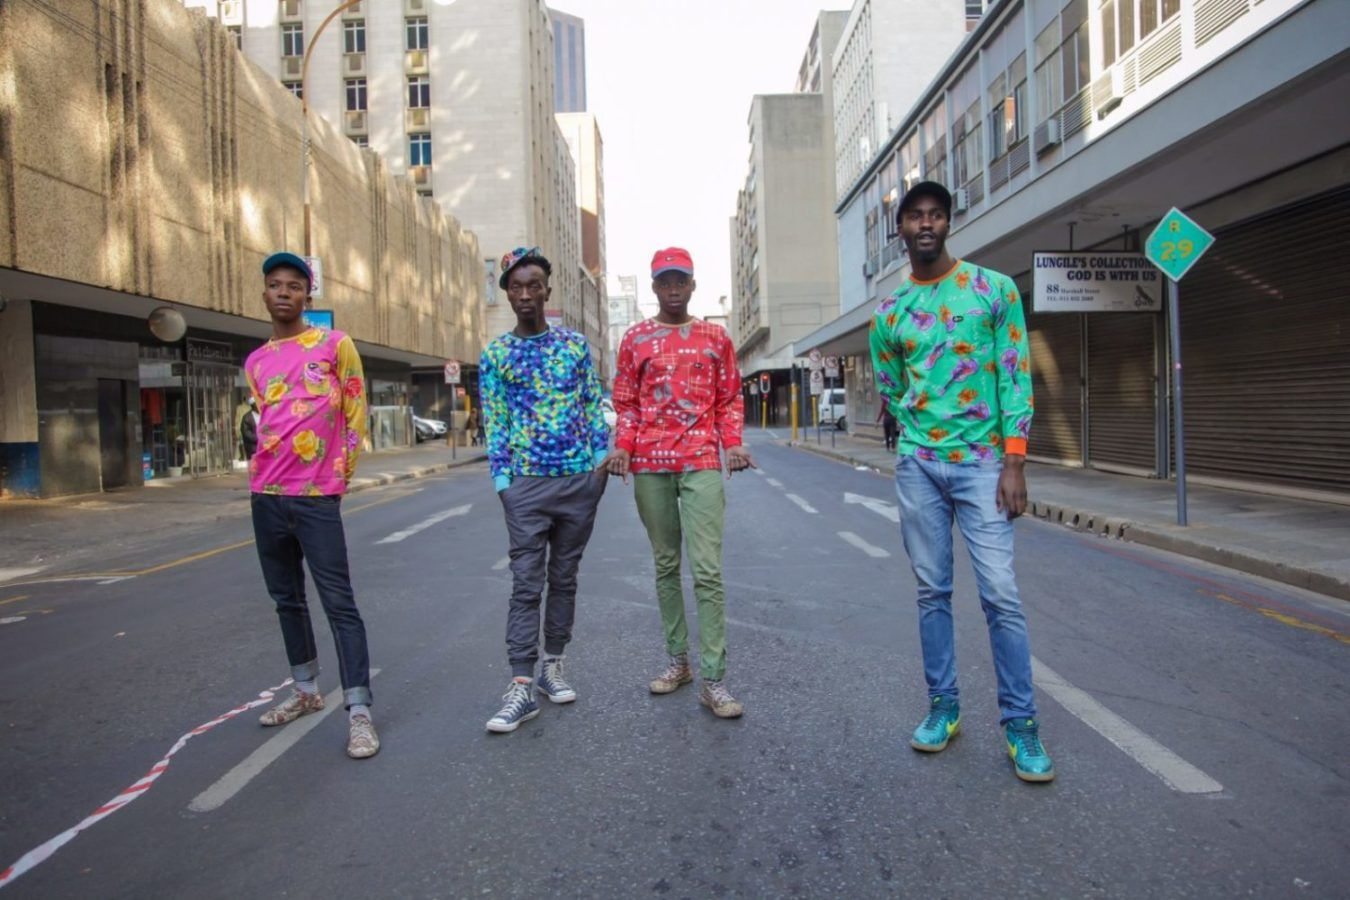 DMD Muracchini Linea Italiana South Africa dmd muracchini stores near you - DMD Linea Italia 2017 Photoshoot Styles 7 - DMD Muracchini Stores near you